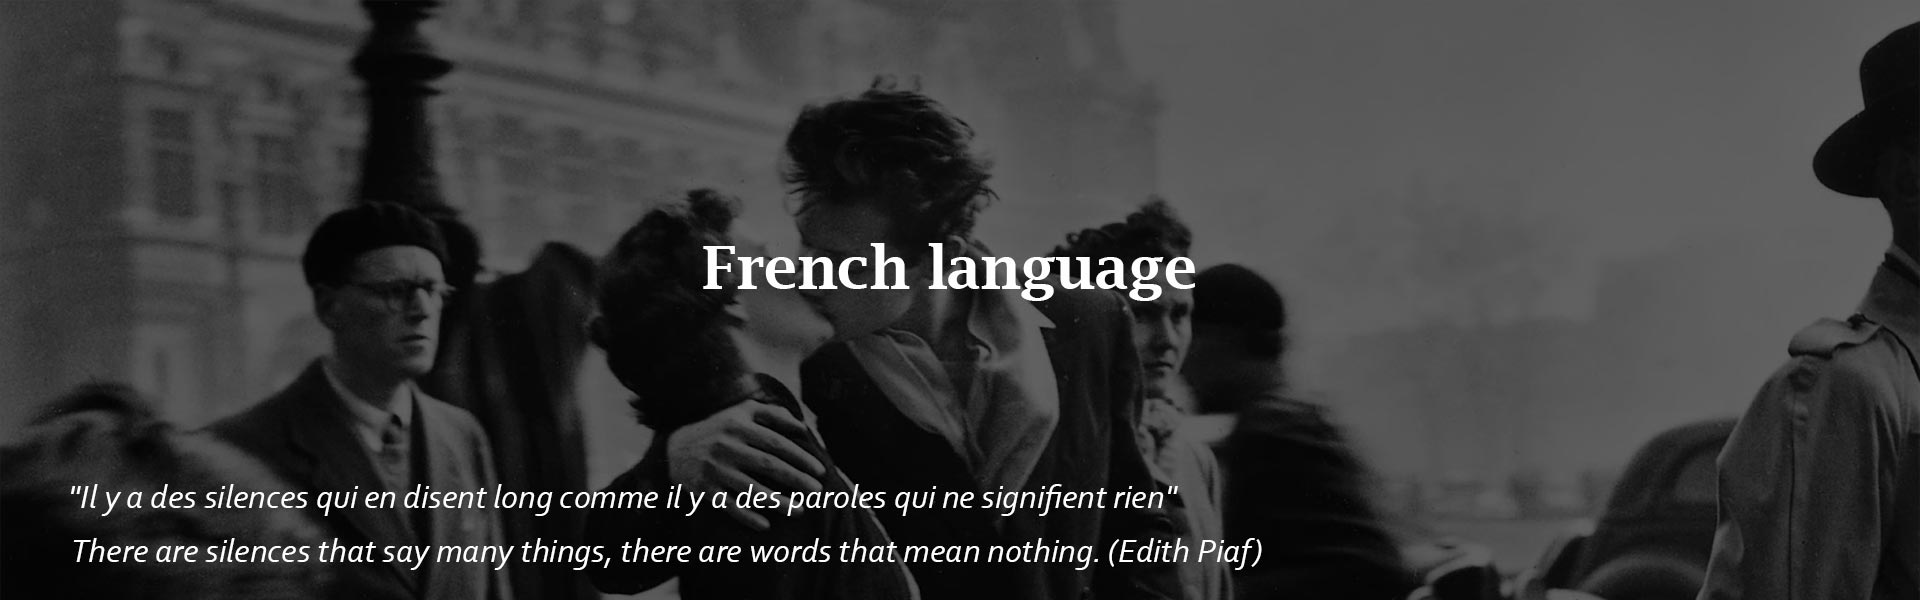 French-language-Alif pisa